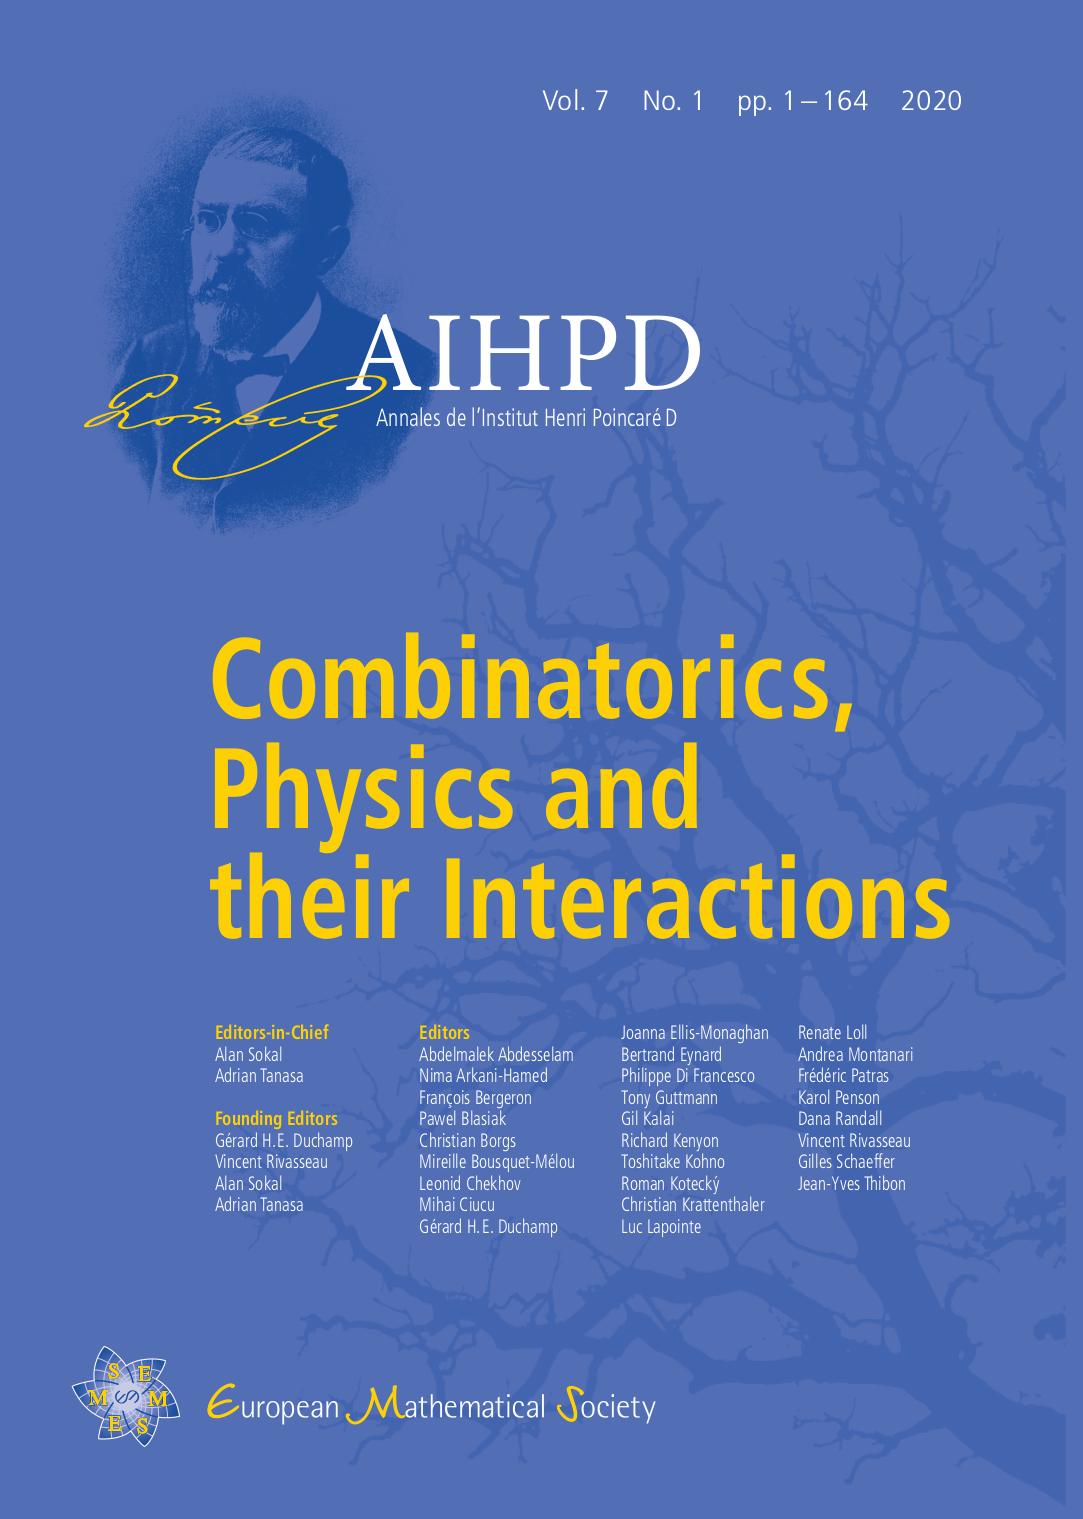 AIHPD cover